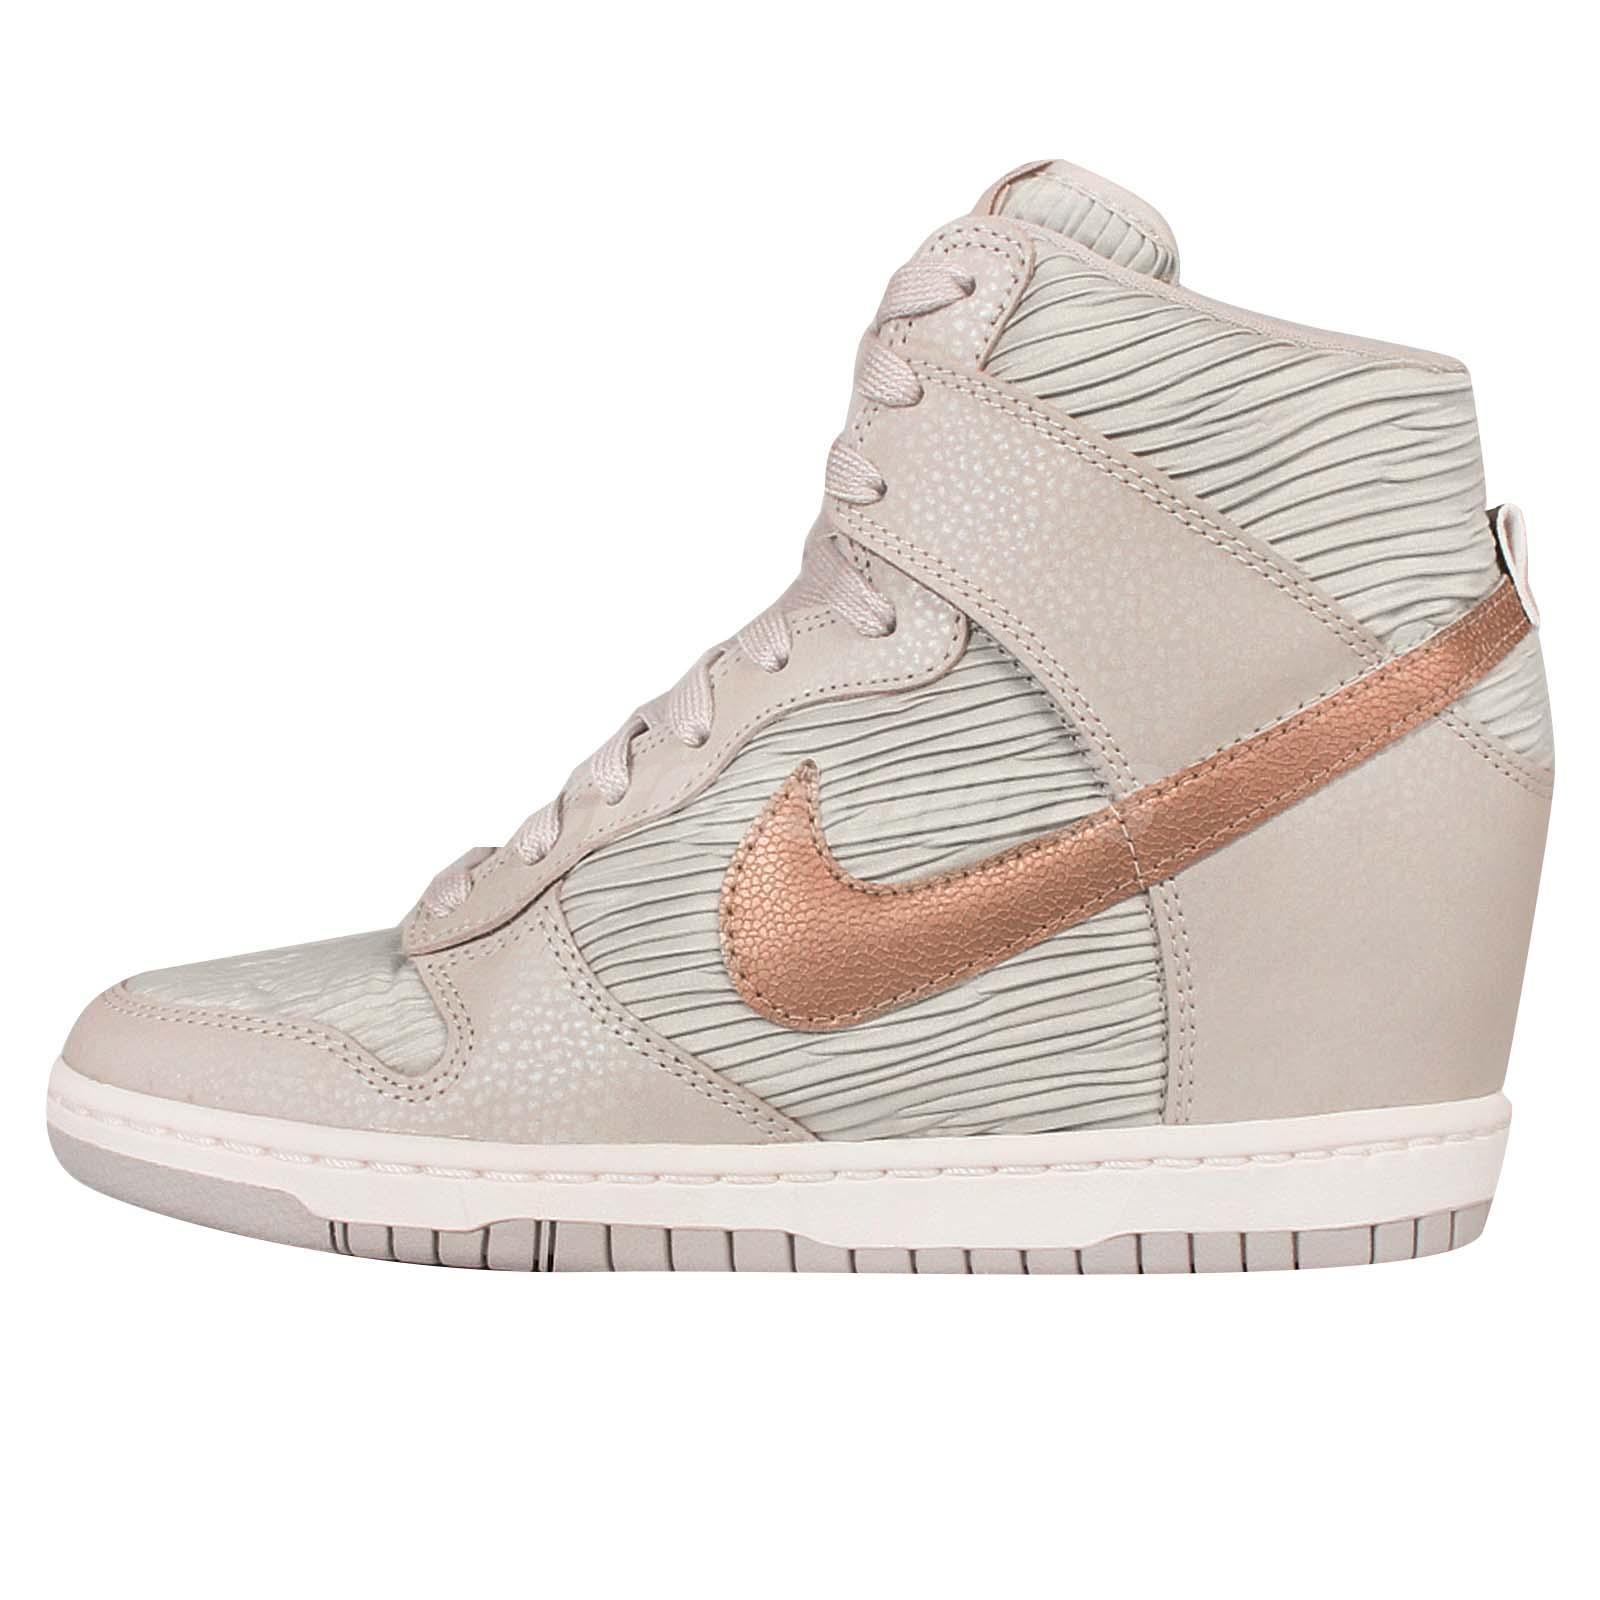 597f35a2b314 nike air yeezy women glow in the dark eyes Nike KD Trey 5 VI  Nike Kobe.  Air Jordan 4 IV Pure Money White Metallic Silver.